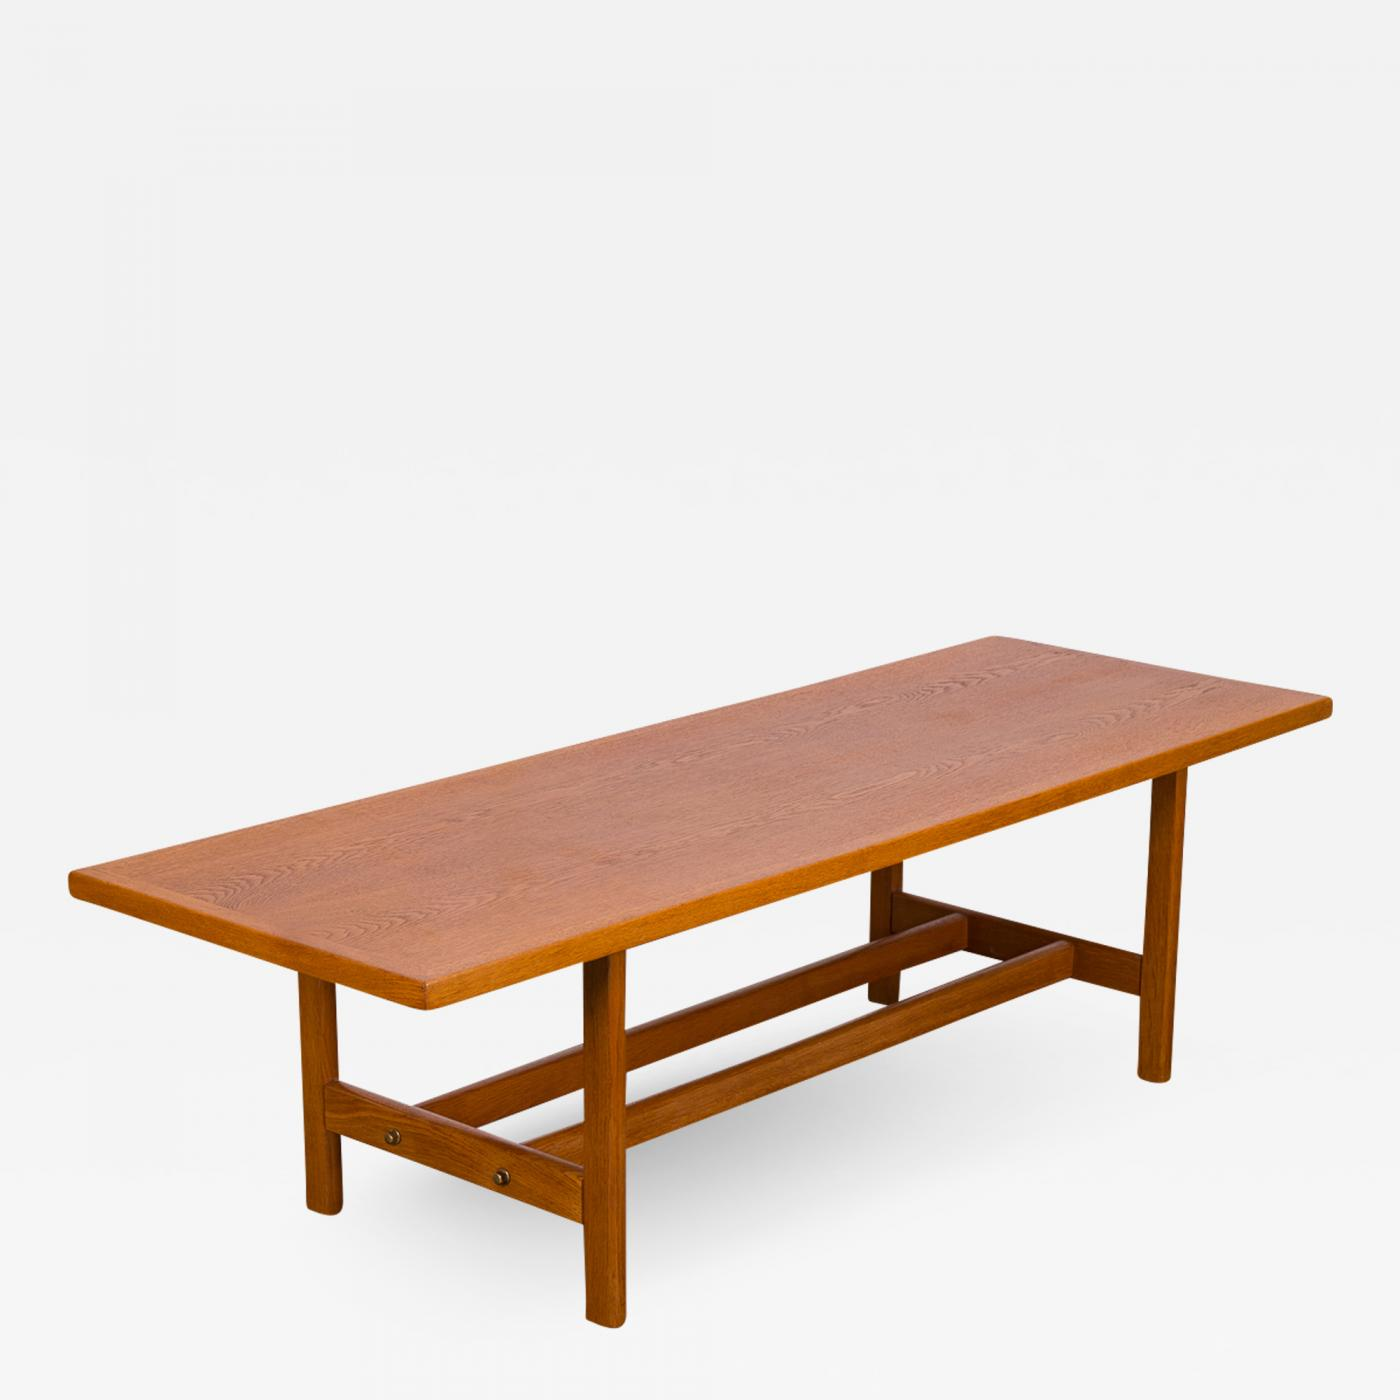 Amazing Scandinavian Rectangular Oak Coffee Table With Shelf Machost Co Dining Chair Design Ideas Machostcouk